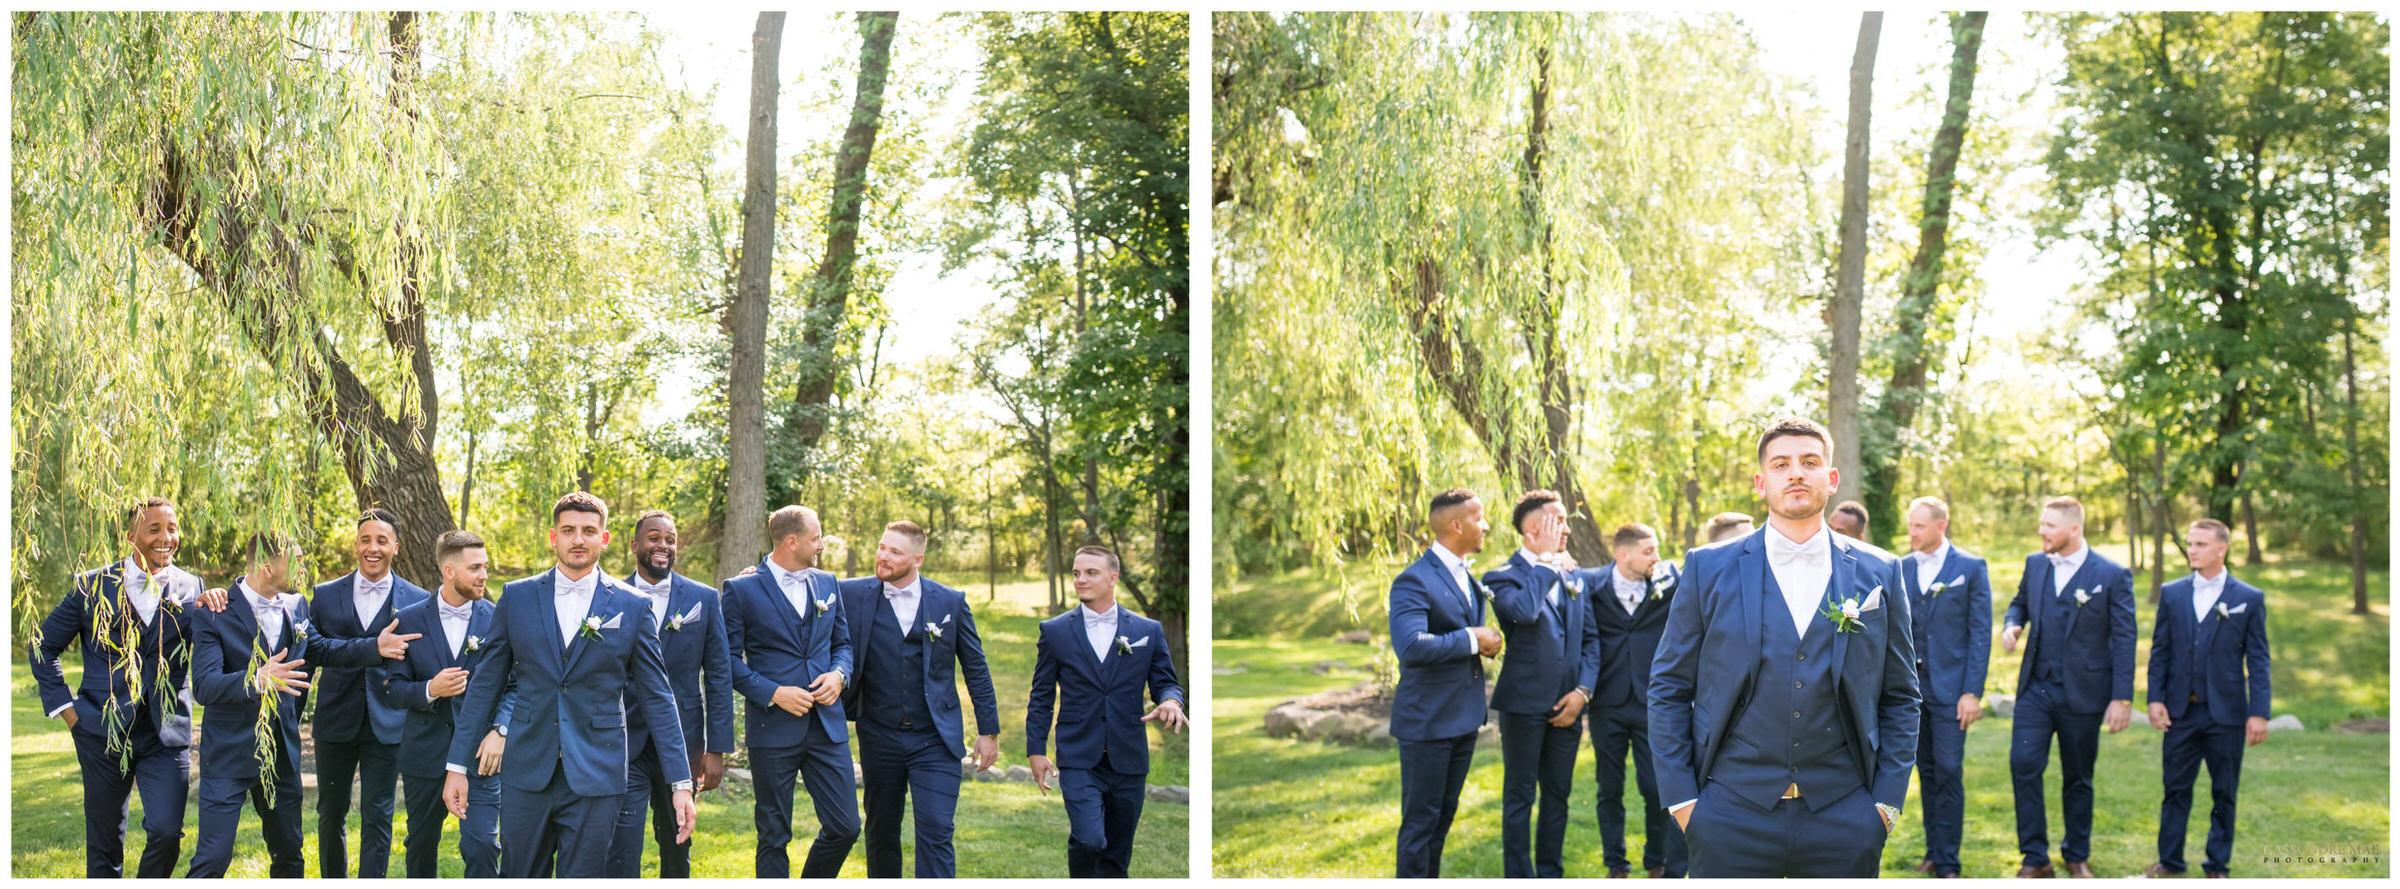 Cassondre Mae Photography Villa Venezia Wedding Photographer 23.jpg